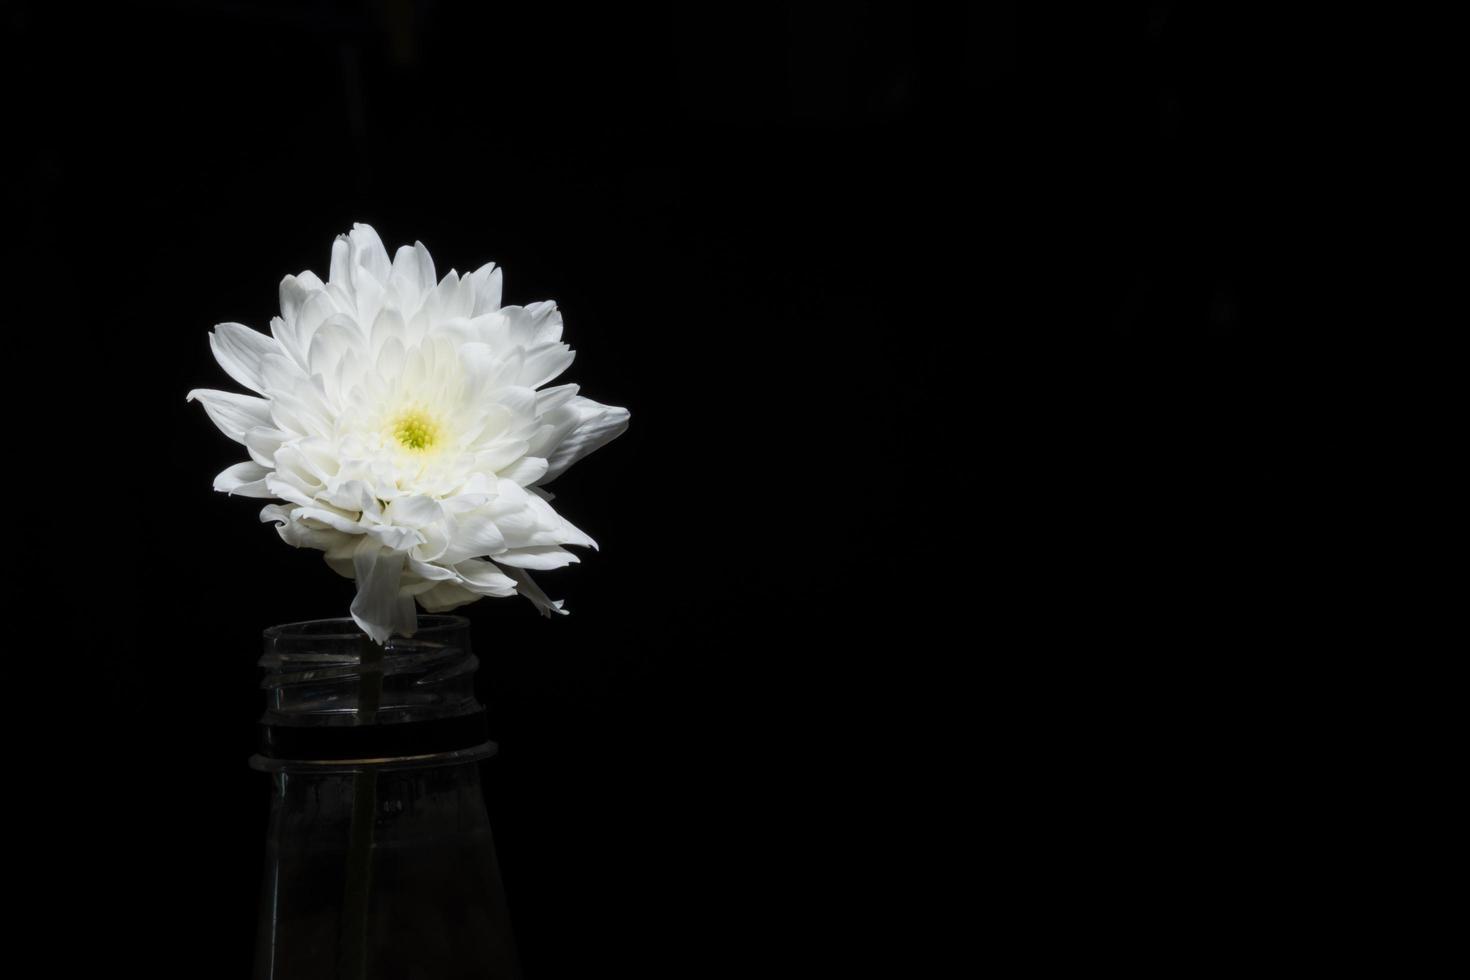 chrysant witte bloem op zwarte achtergrond foto